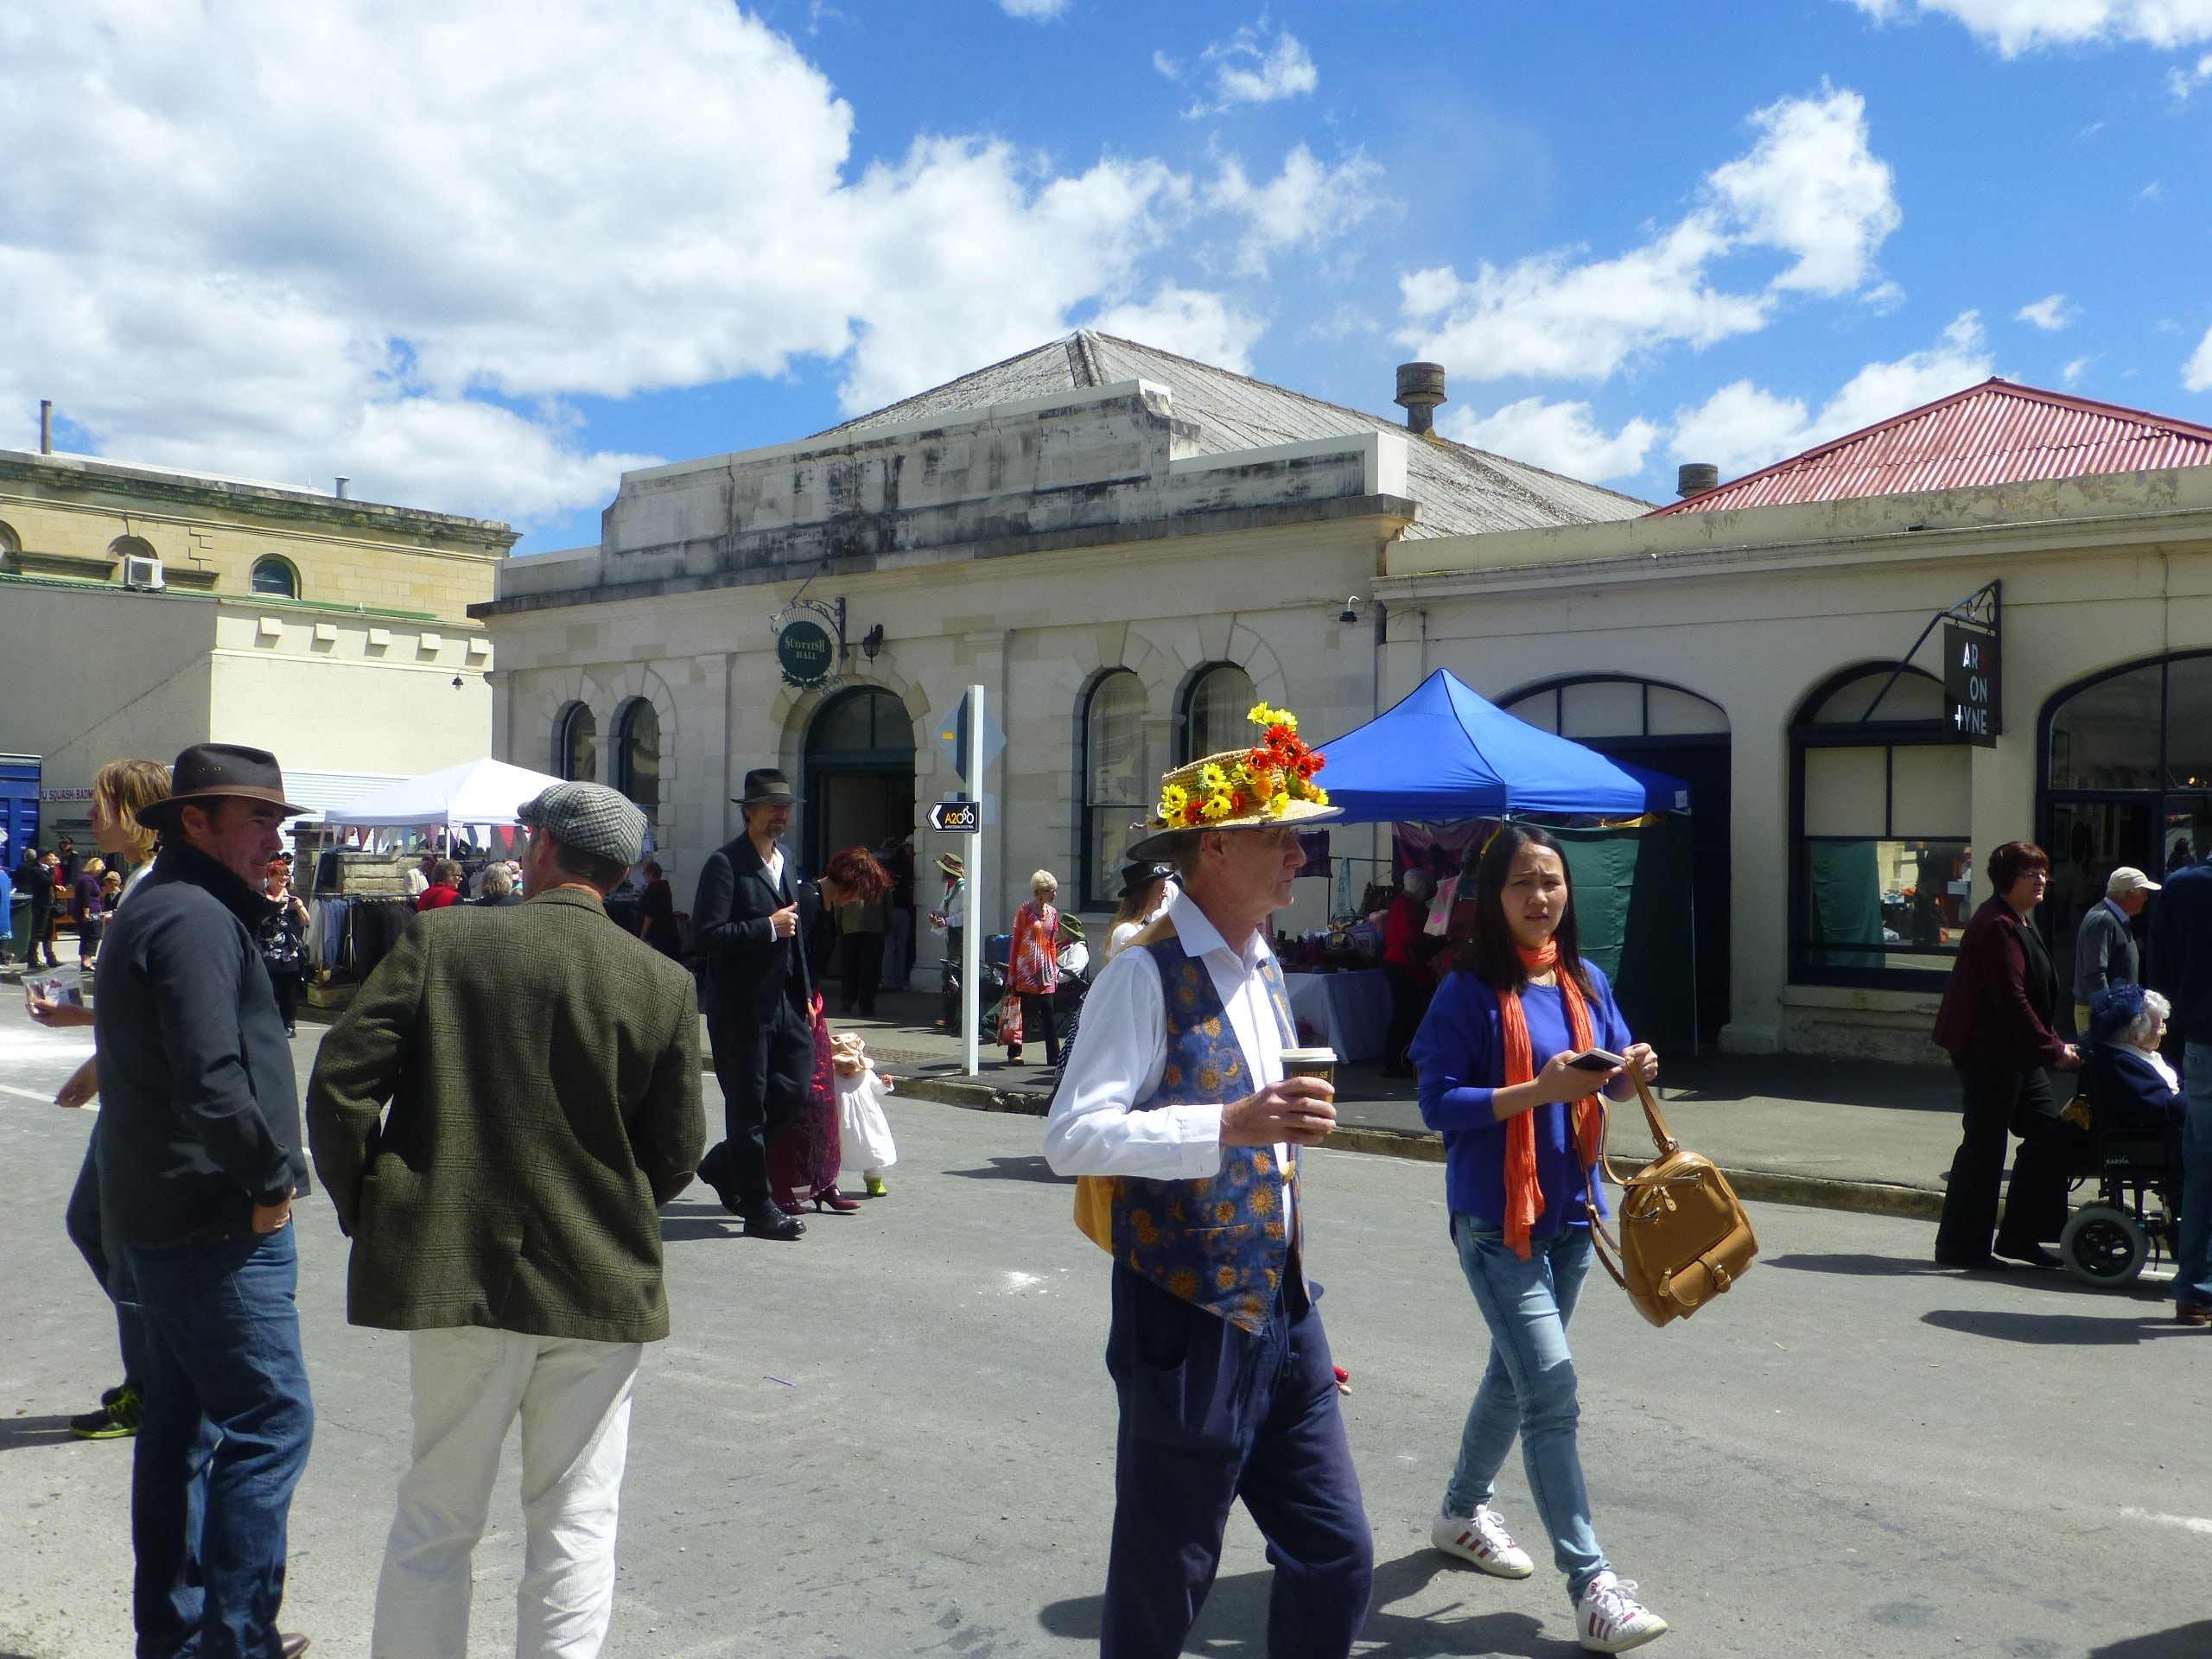 Viktorian Festival in Oamaru 20